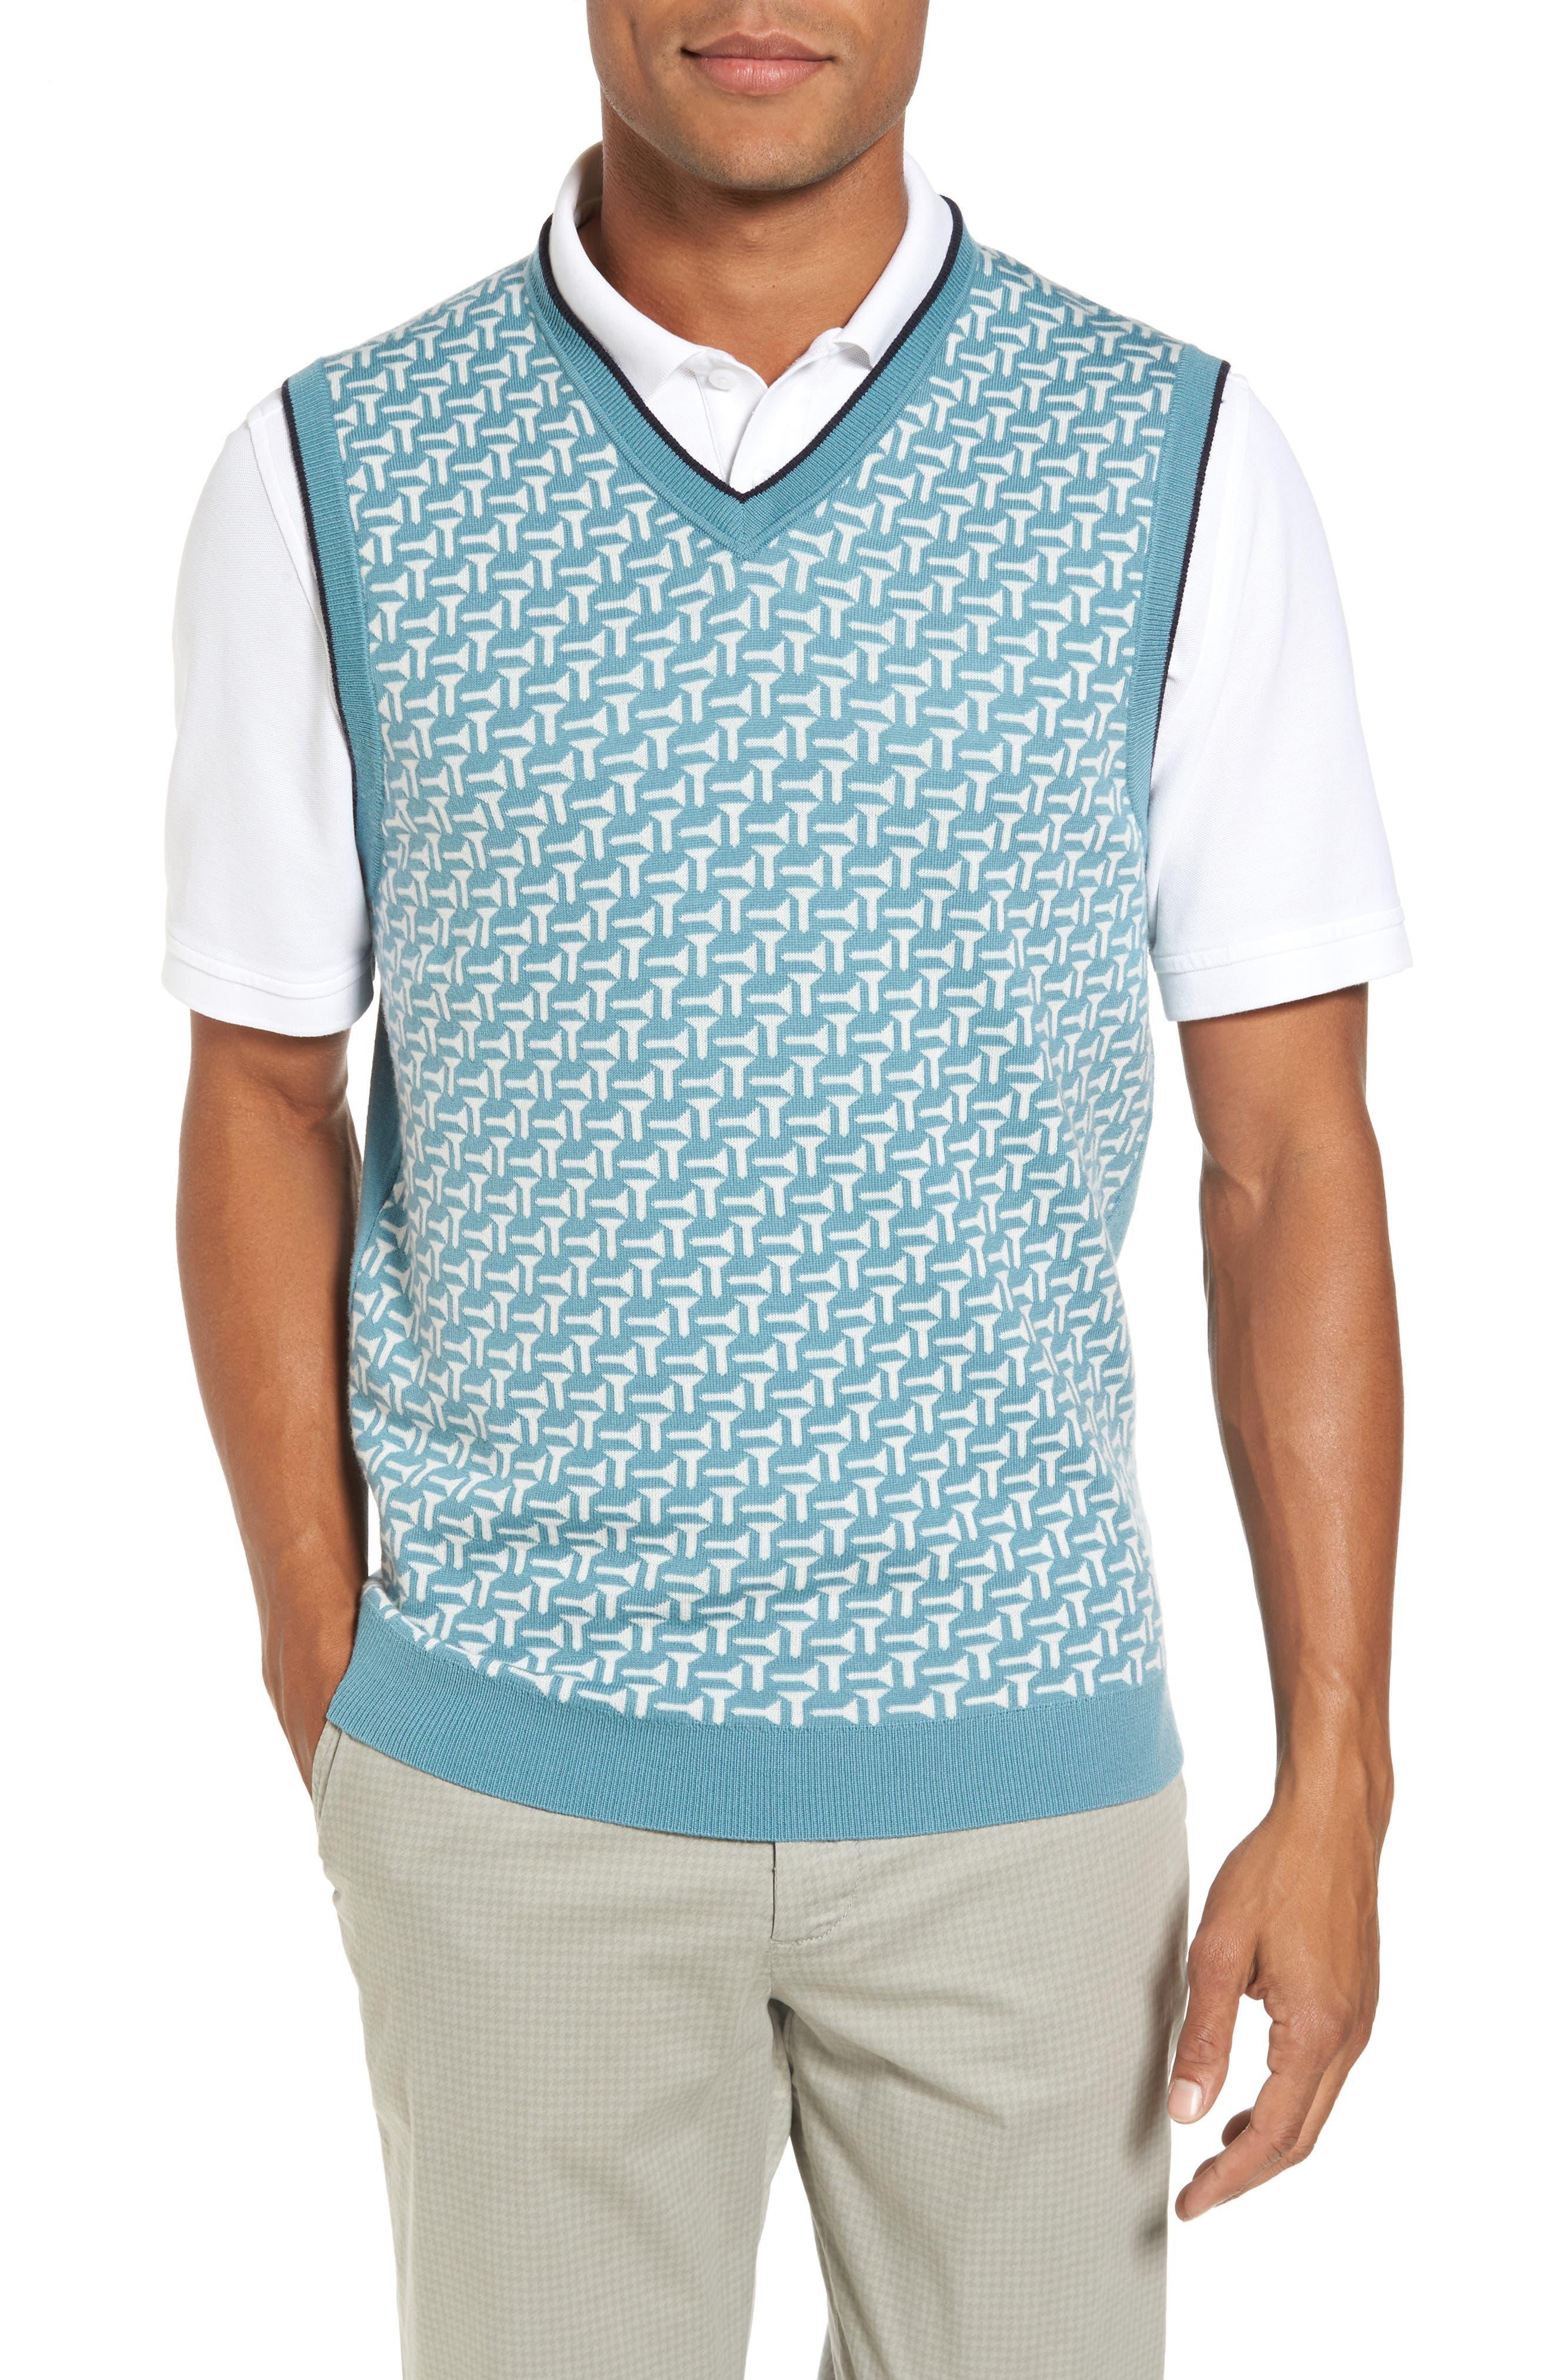 Tommas Golf Merino Sweater Vest,                         Main,                         color, 331